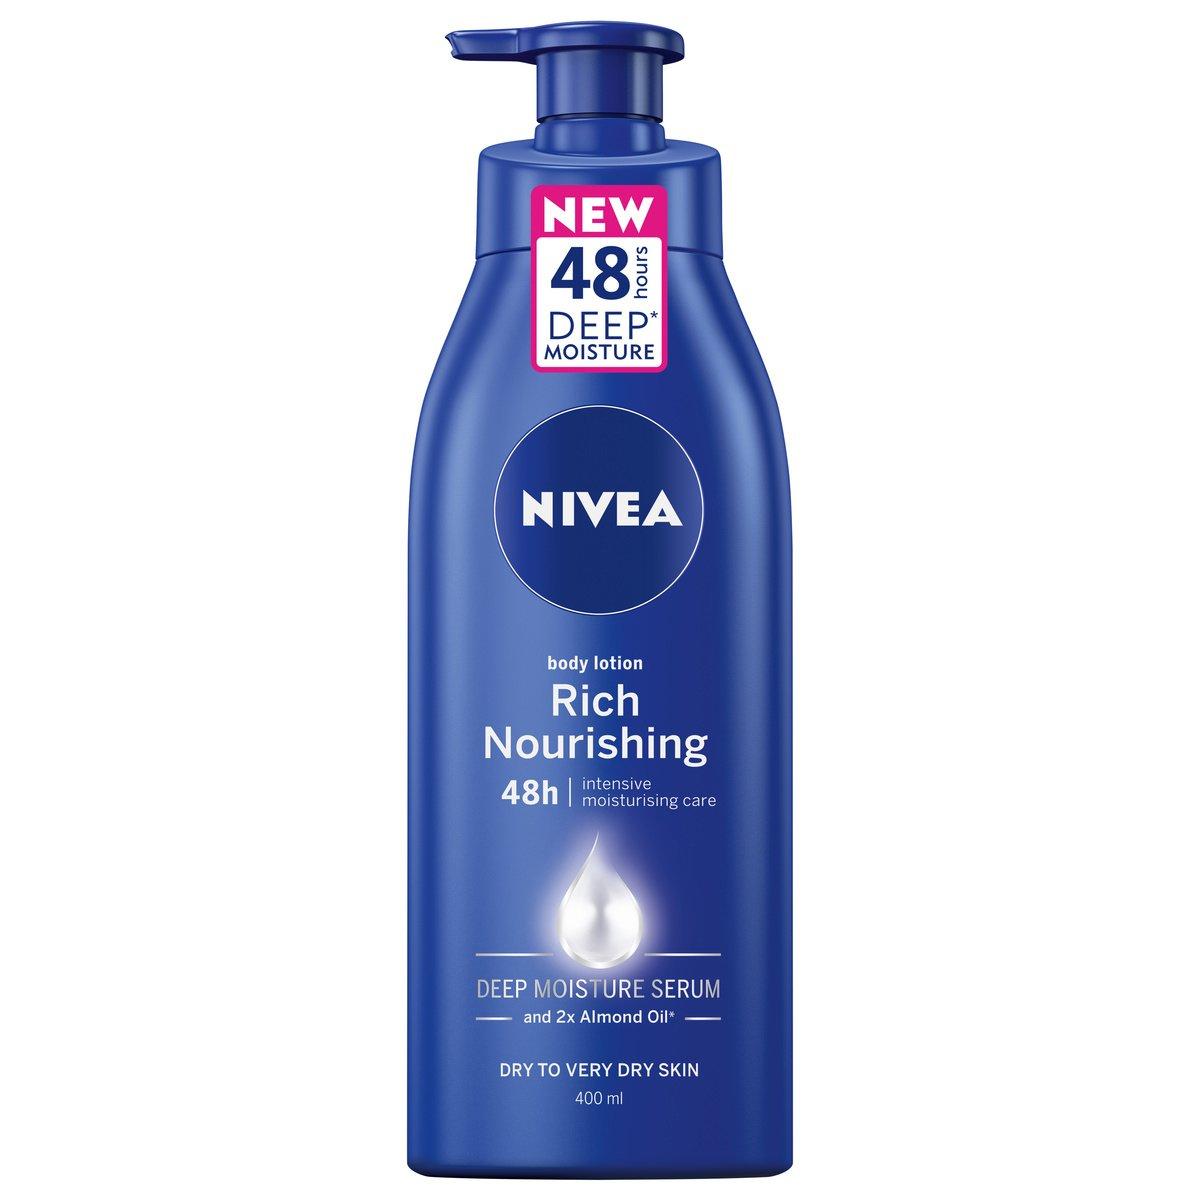 Nivea Body Nourishing Milk Pump Θρεπτικό Γαλάκτωμα Σώματος 48ωρης Βαθιάς Ενυδάτωσης & Απαλότητας με Αντλία 400ml